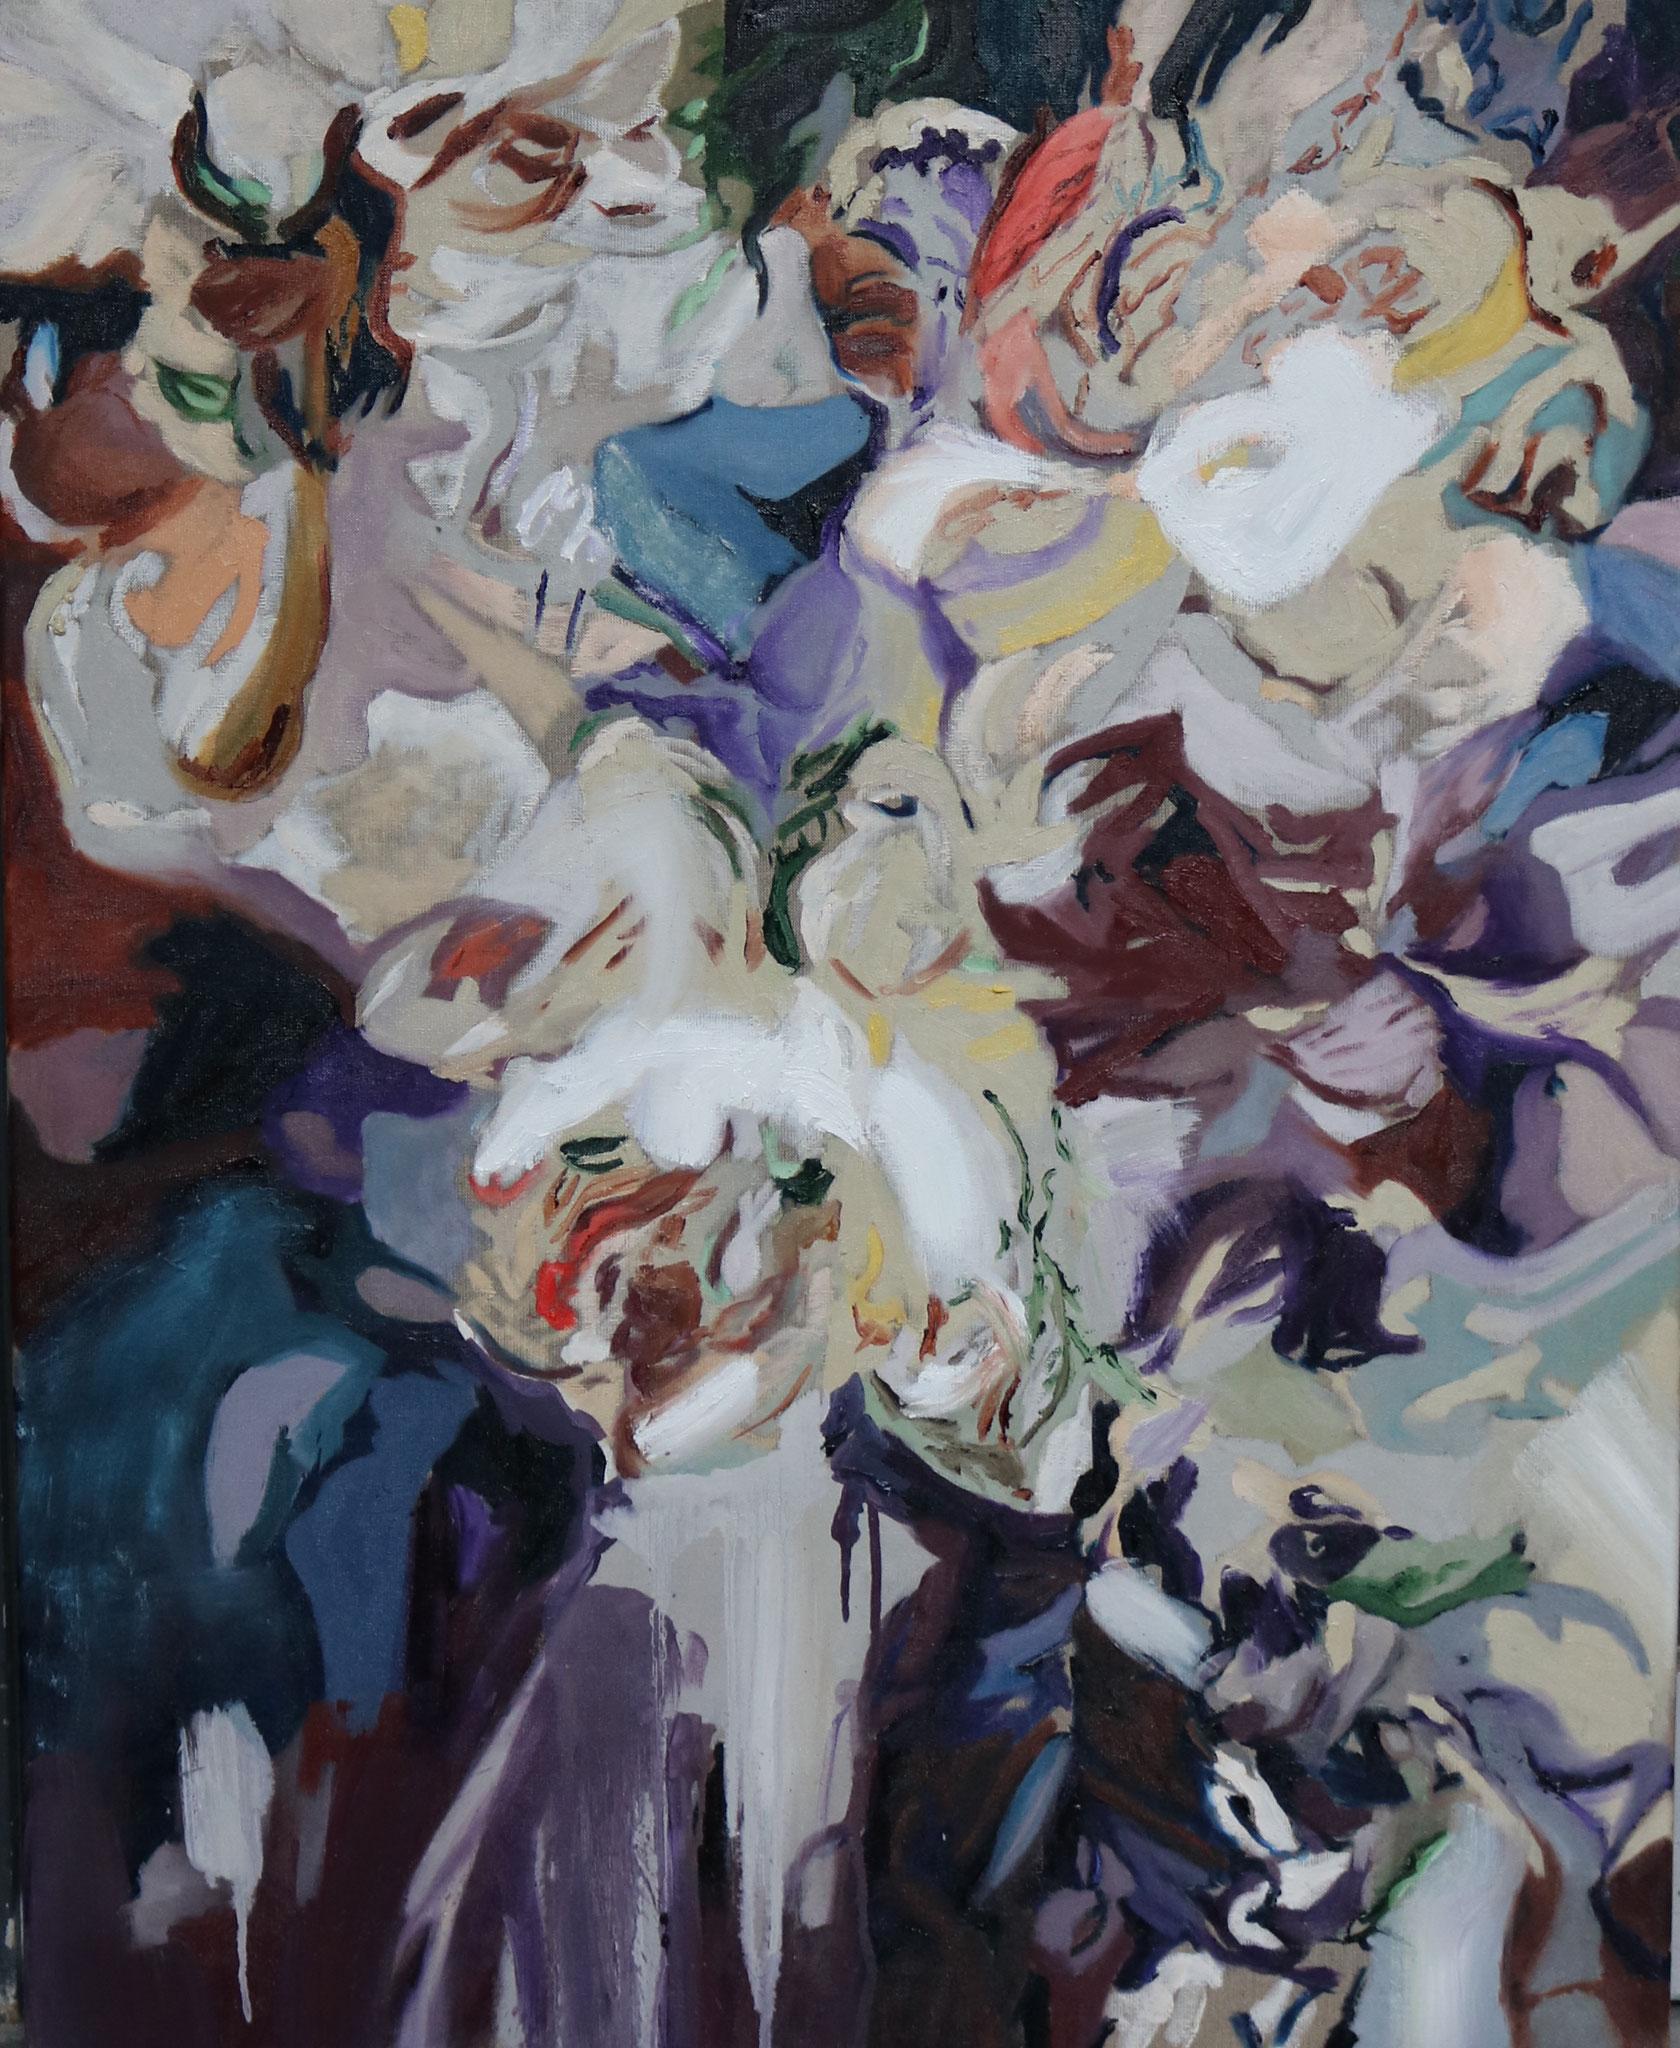 """Blumen II"" 80 x 100cm - Öl auf Leinwand"